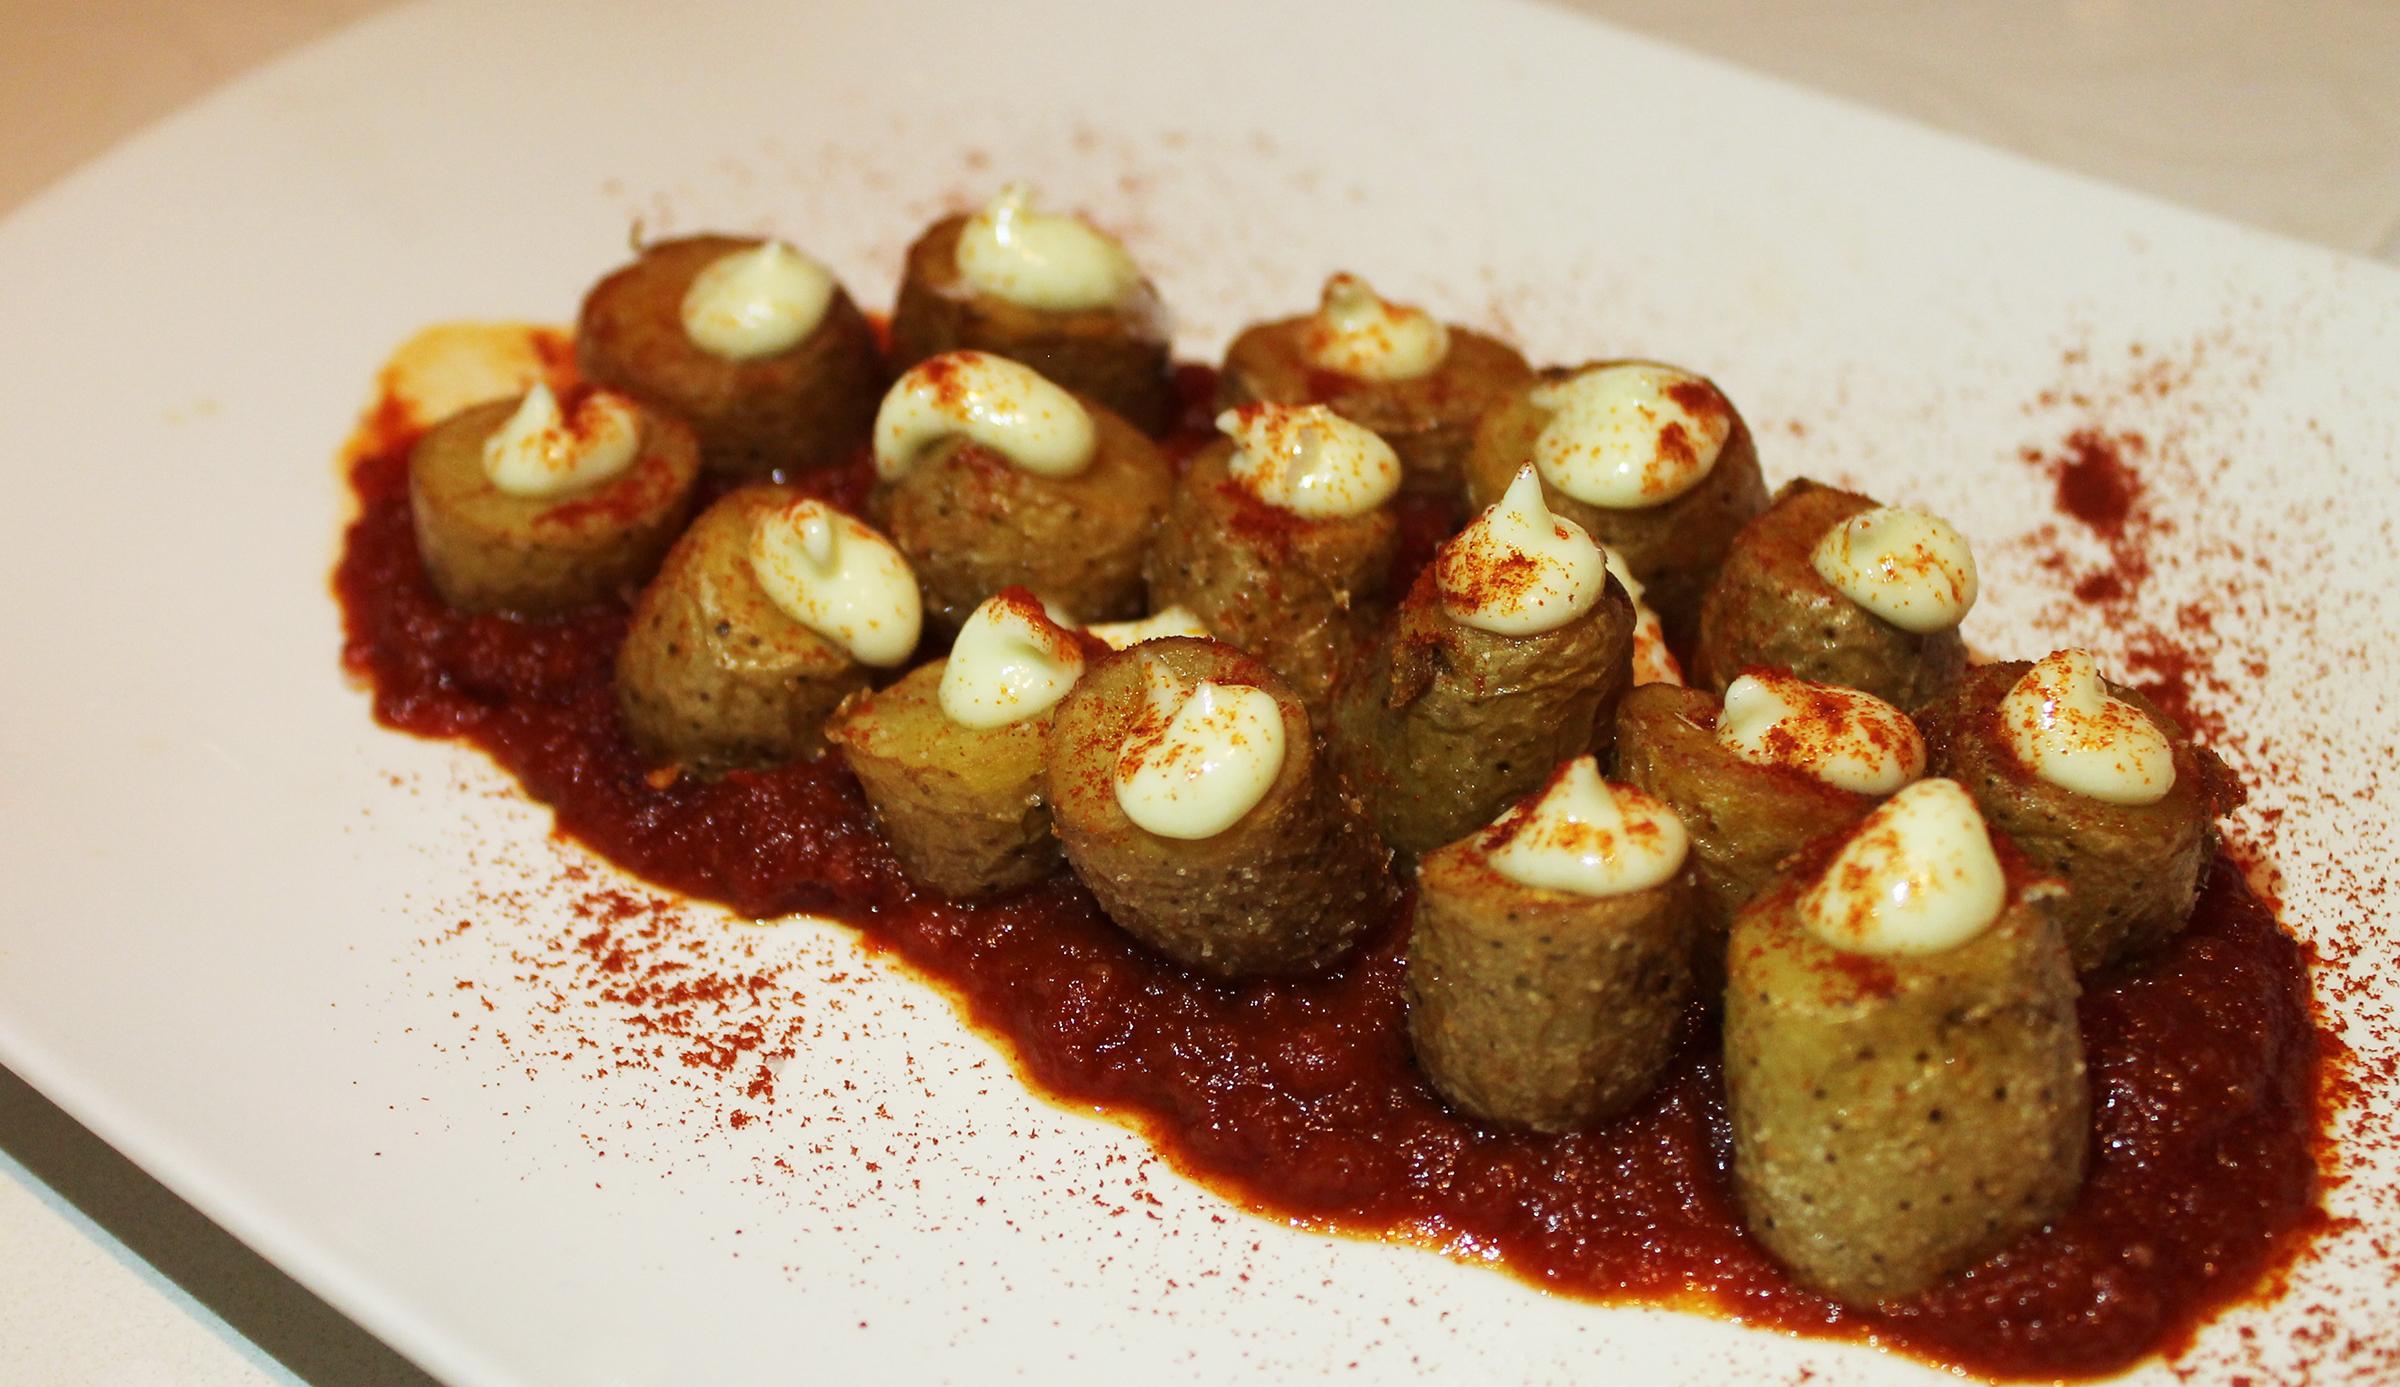 Patatas Bravas: A Jaleo favorite with spicy tomato sauce and alioli